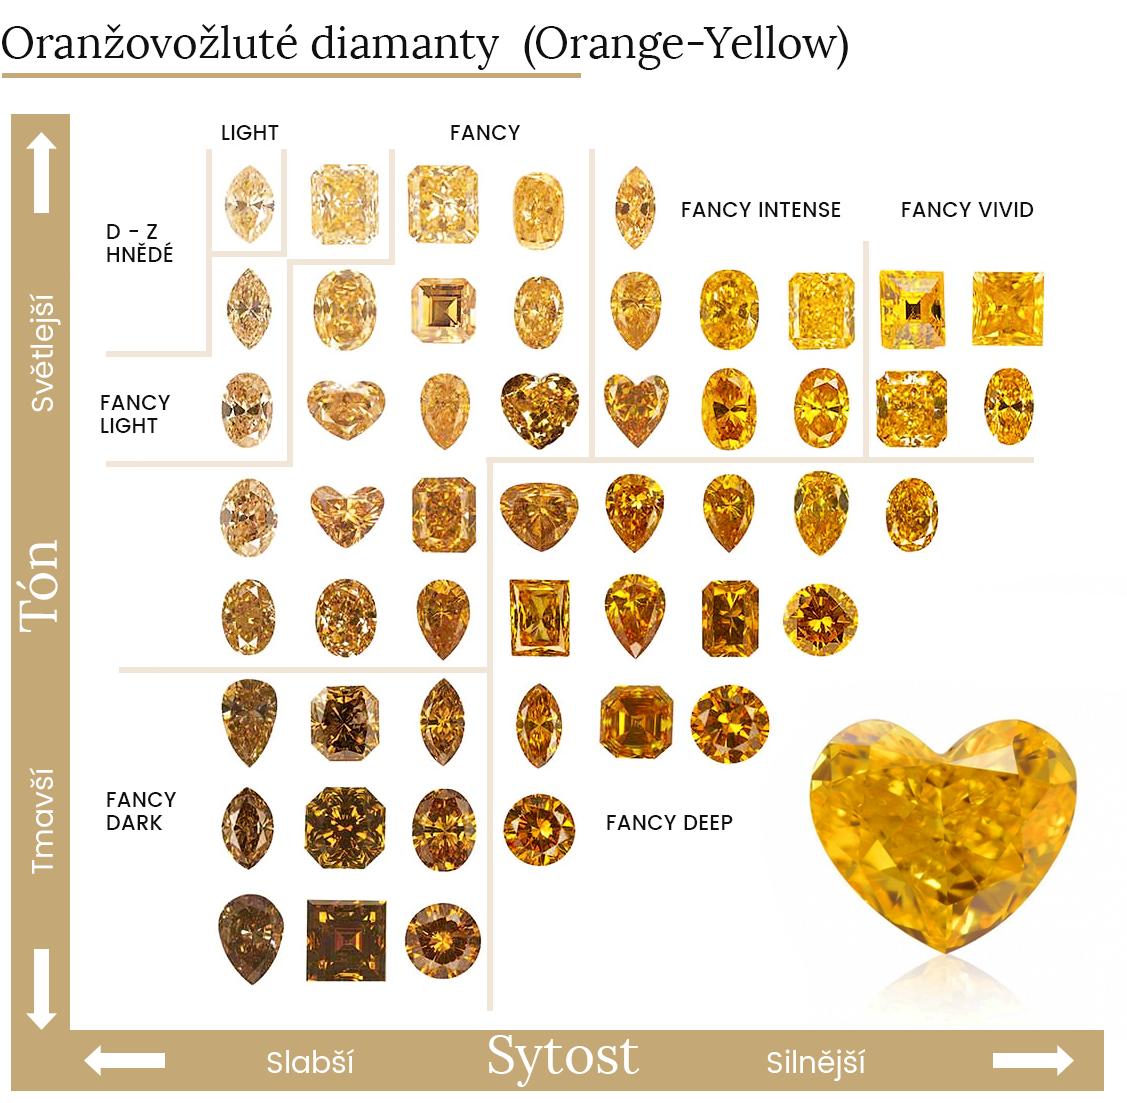 Oranžovožluté diamanty